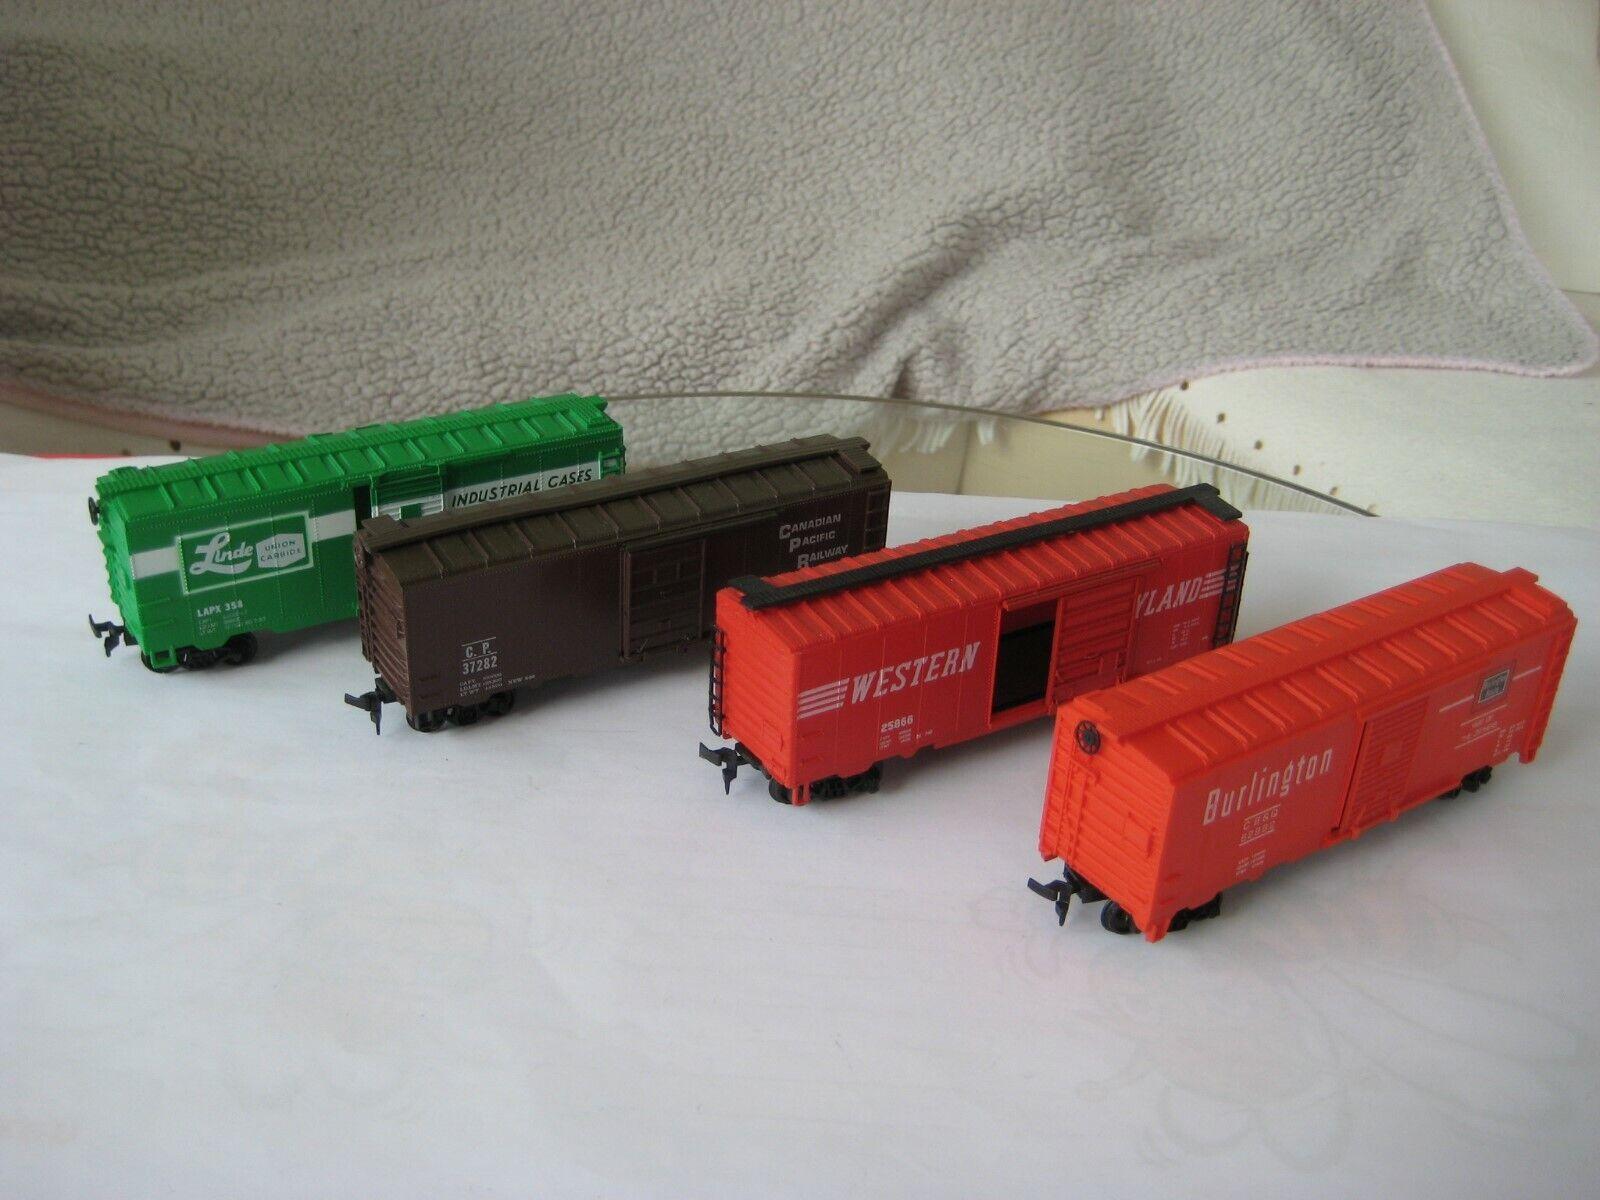 US-GüterwagenBoxcar 4 Stk-40 ft Steel div Bahngesellschaften    | Bevorzugtes Material  8be980